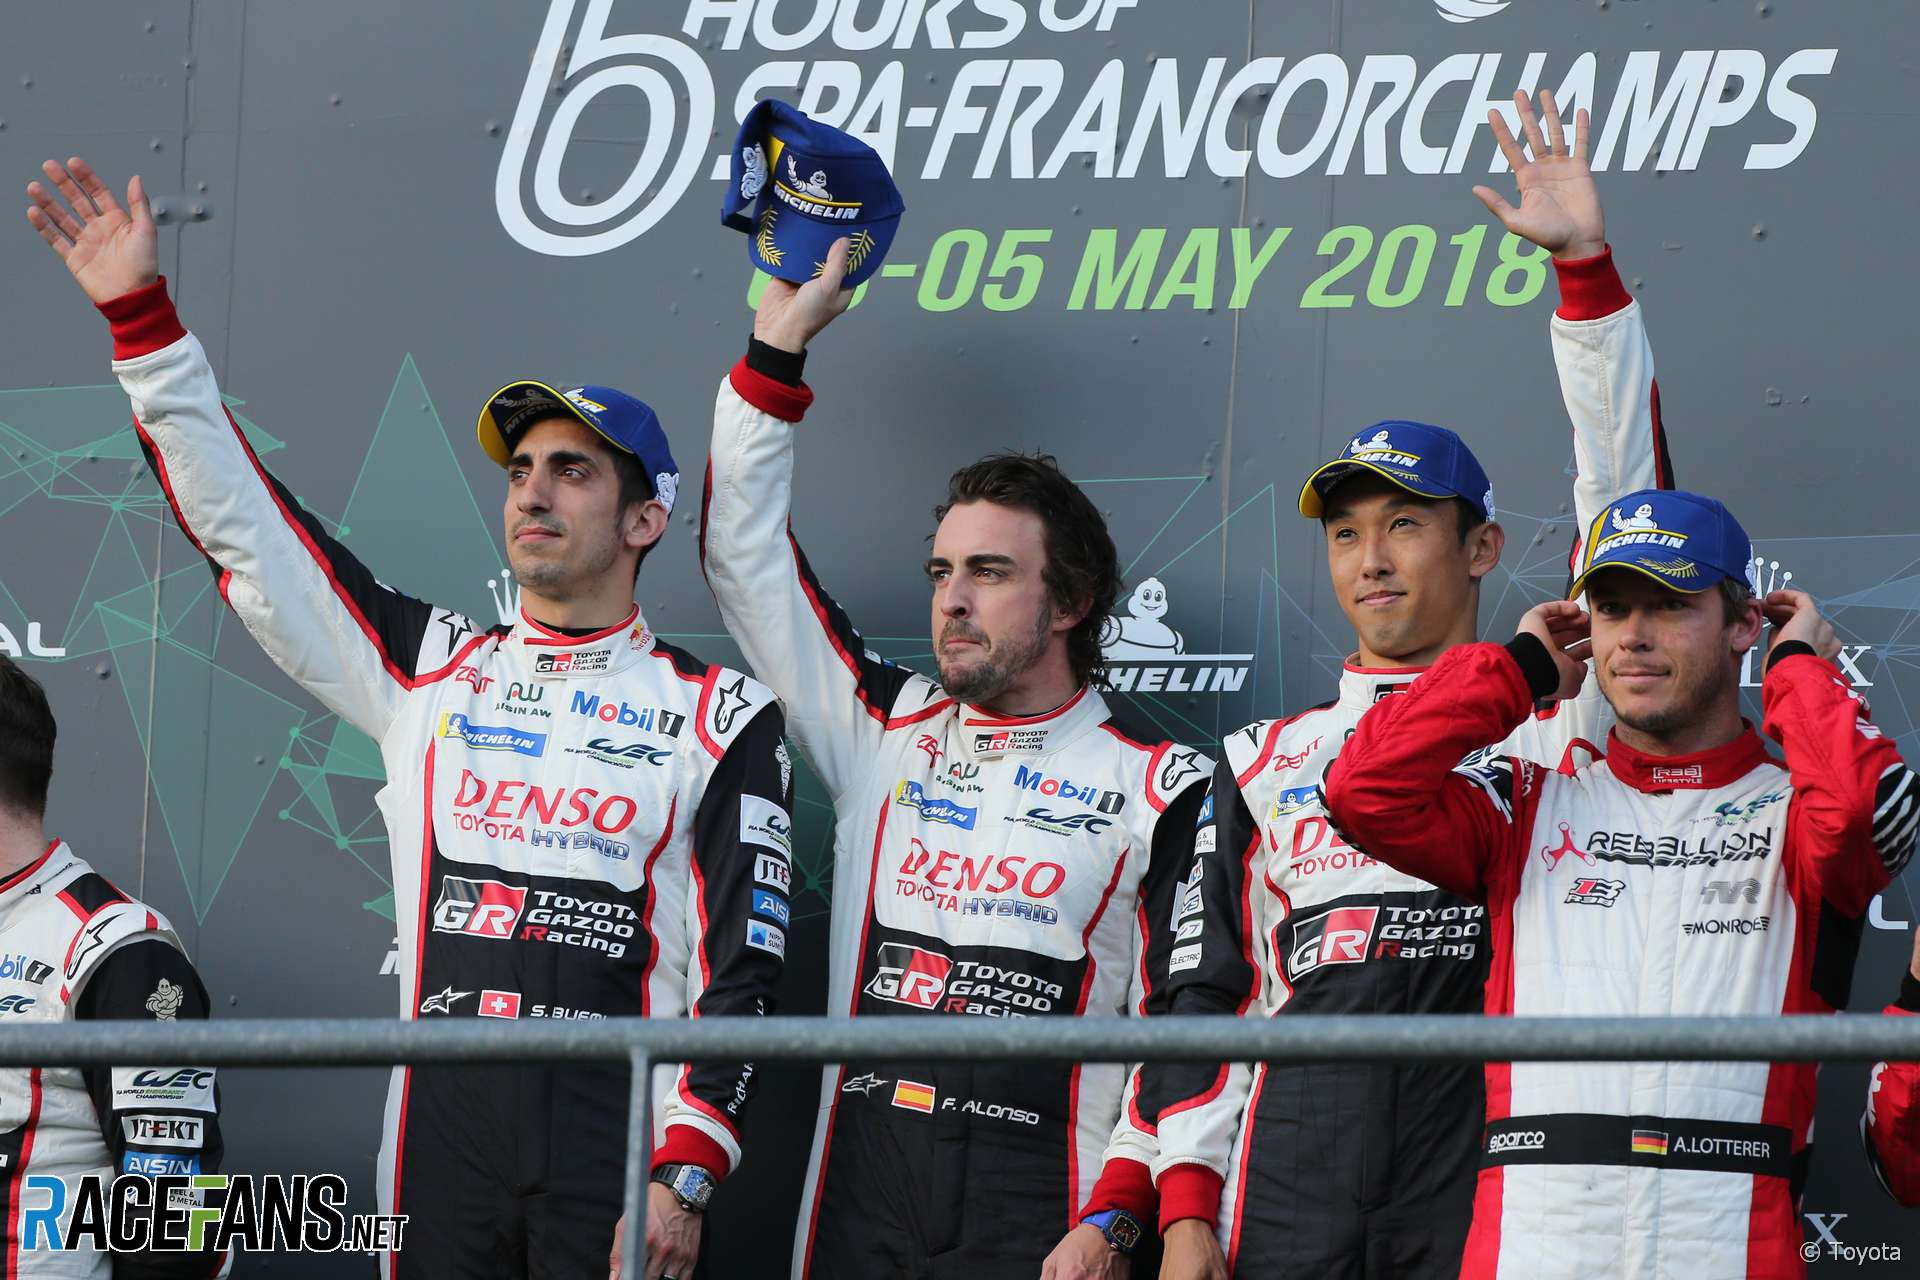 Sebastien Buemi, Fernando Alonso, Kazuki Nakajima, Toyota, Spa-Francorchamps, WEC, 2018